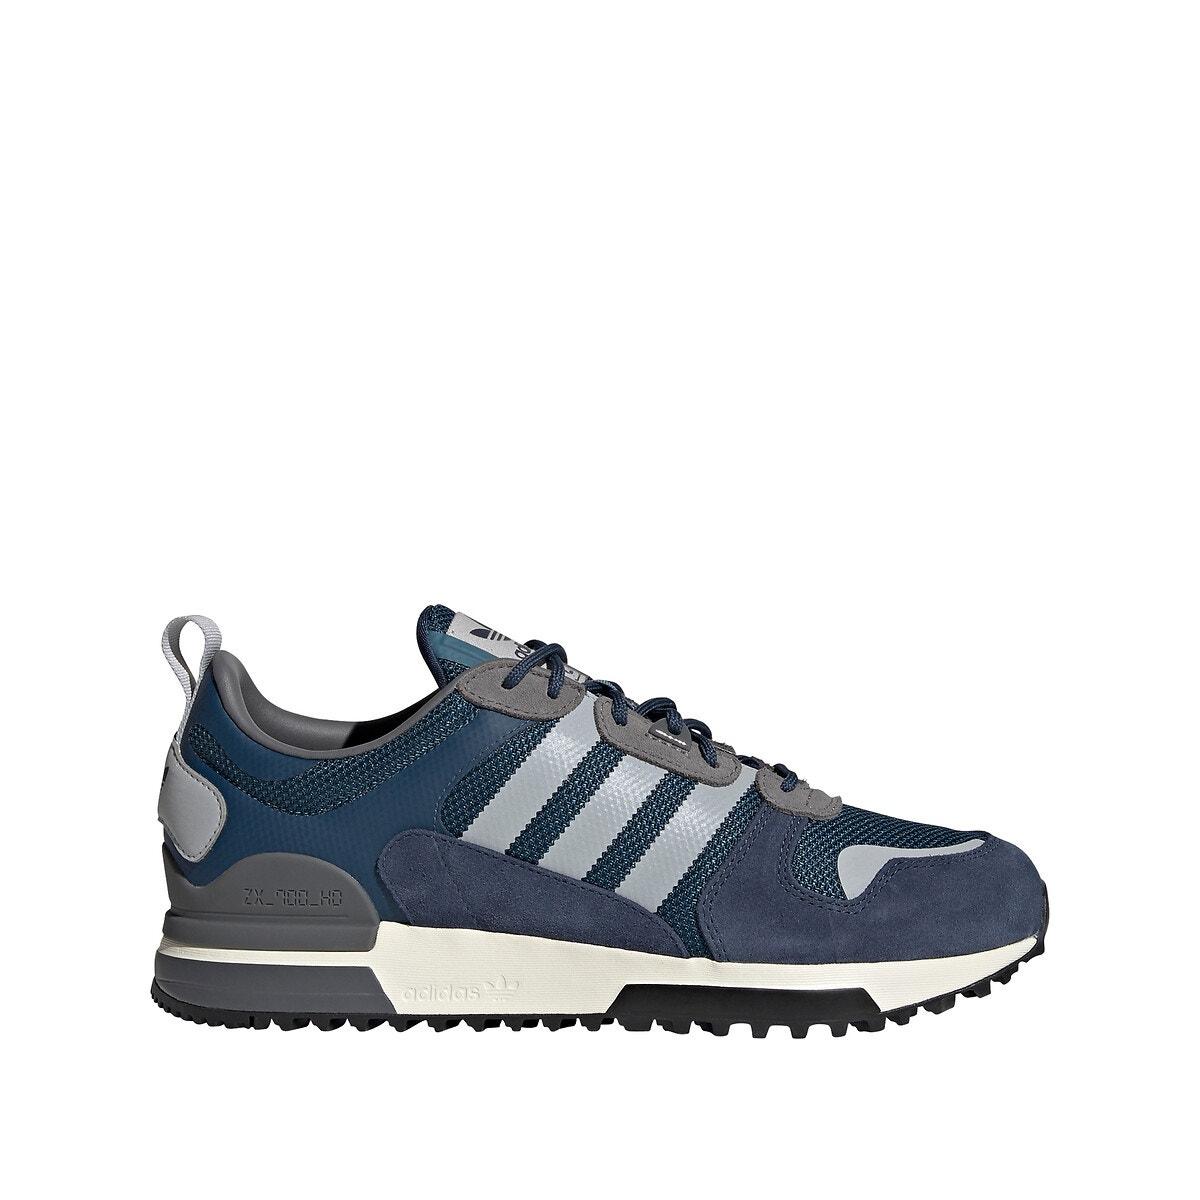 Adidas zx 700 homme   La Redoute